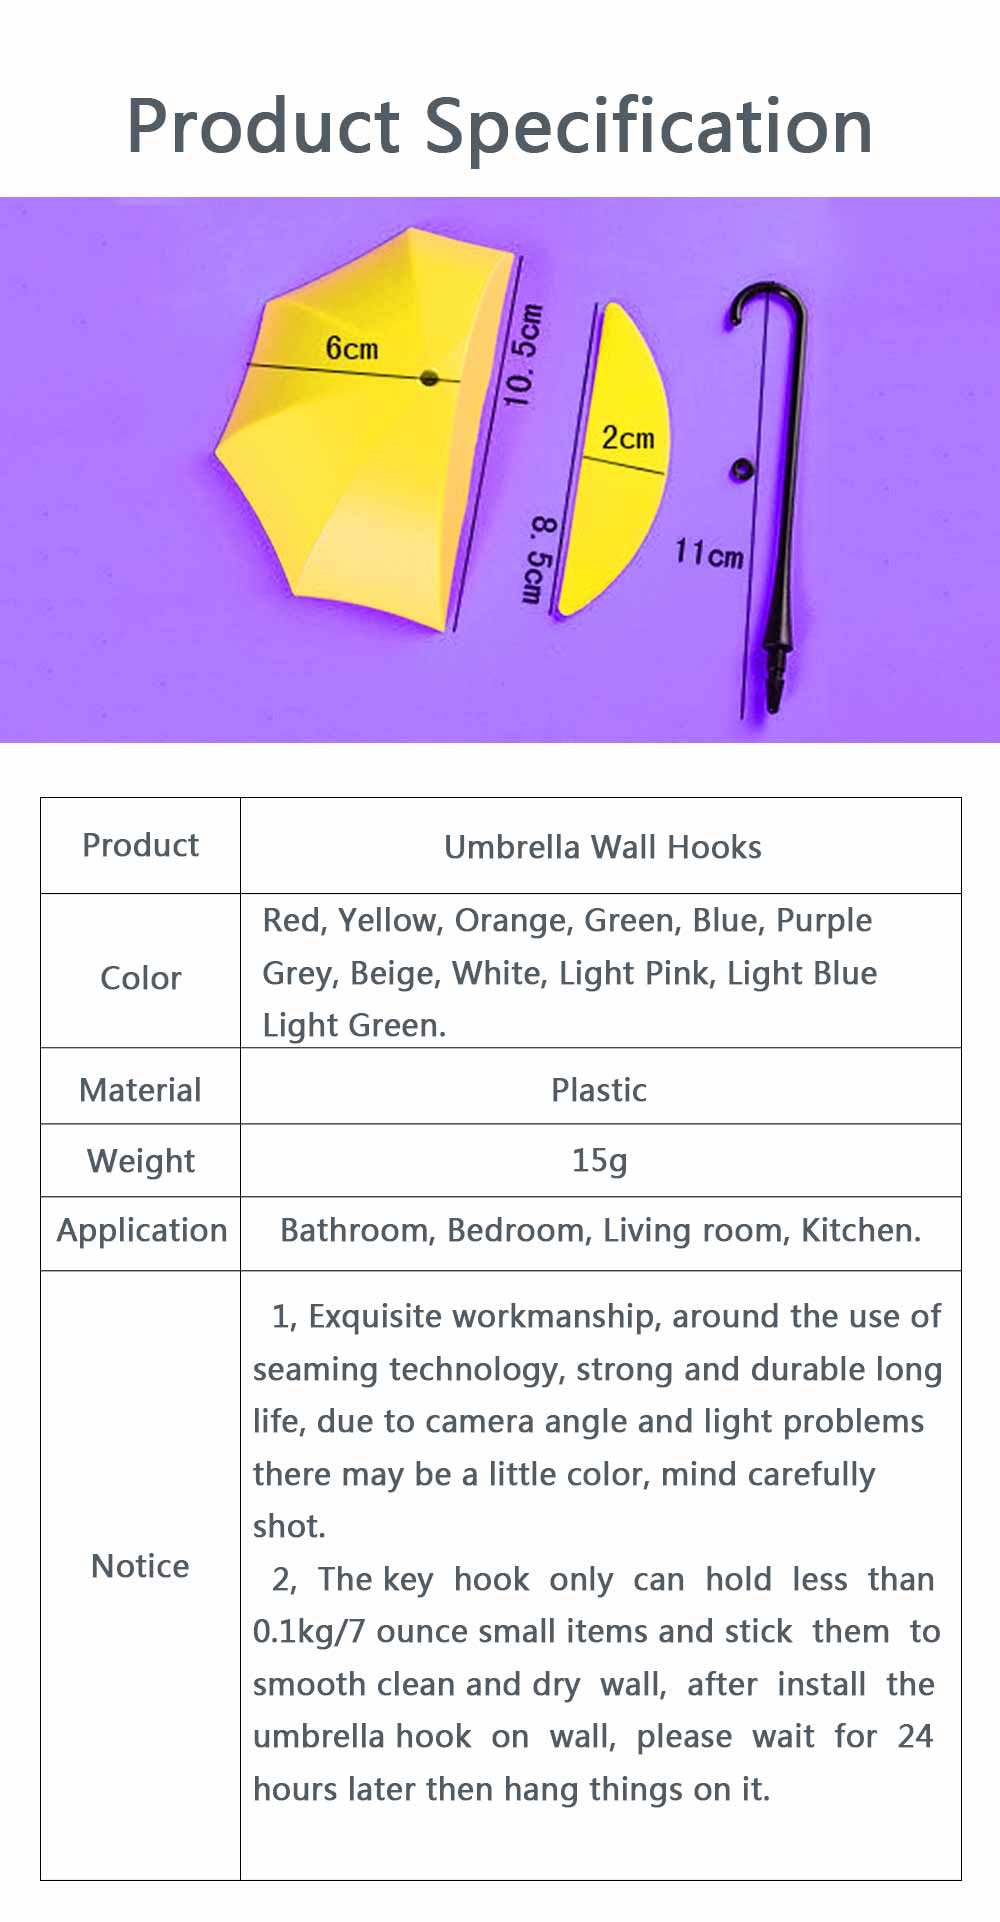 Umbrella Wall Hooks, Cute Little Sticky Hanging Hooks for Hat Purse Key Storage (3 packs) 8